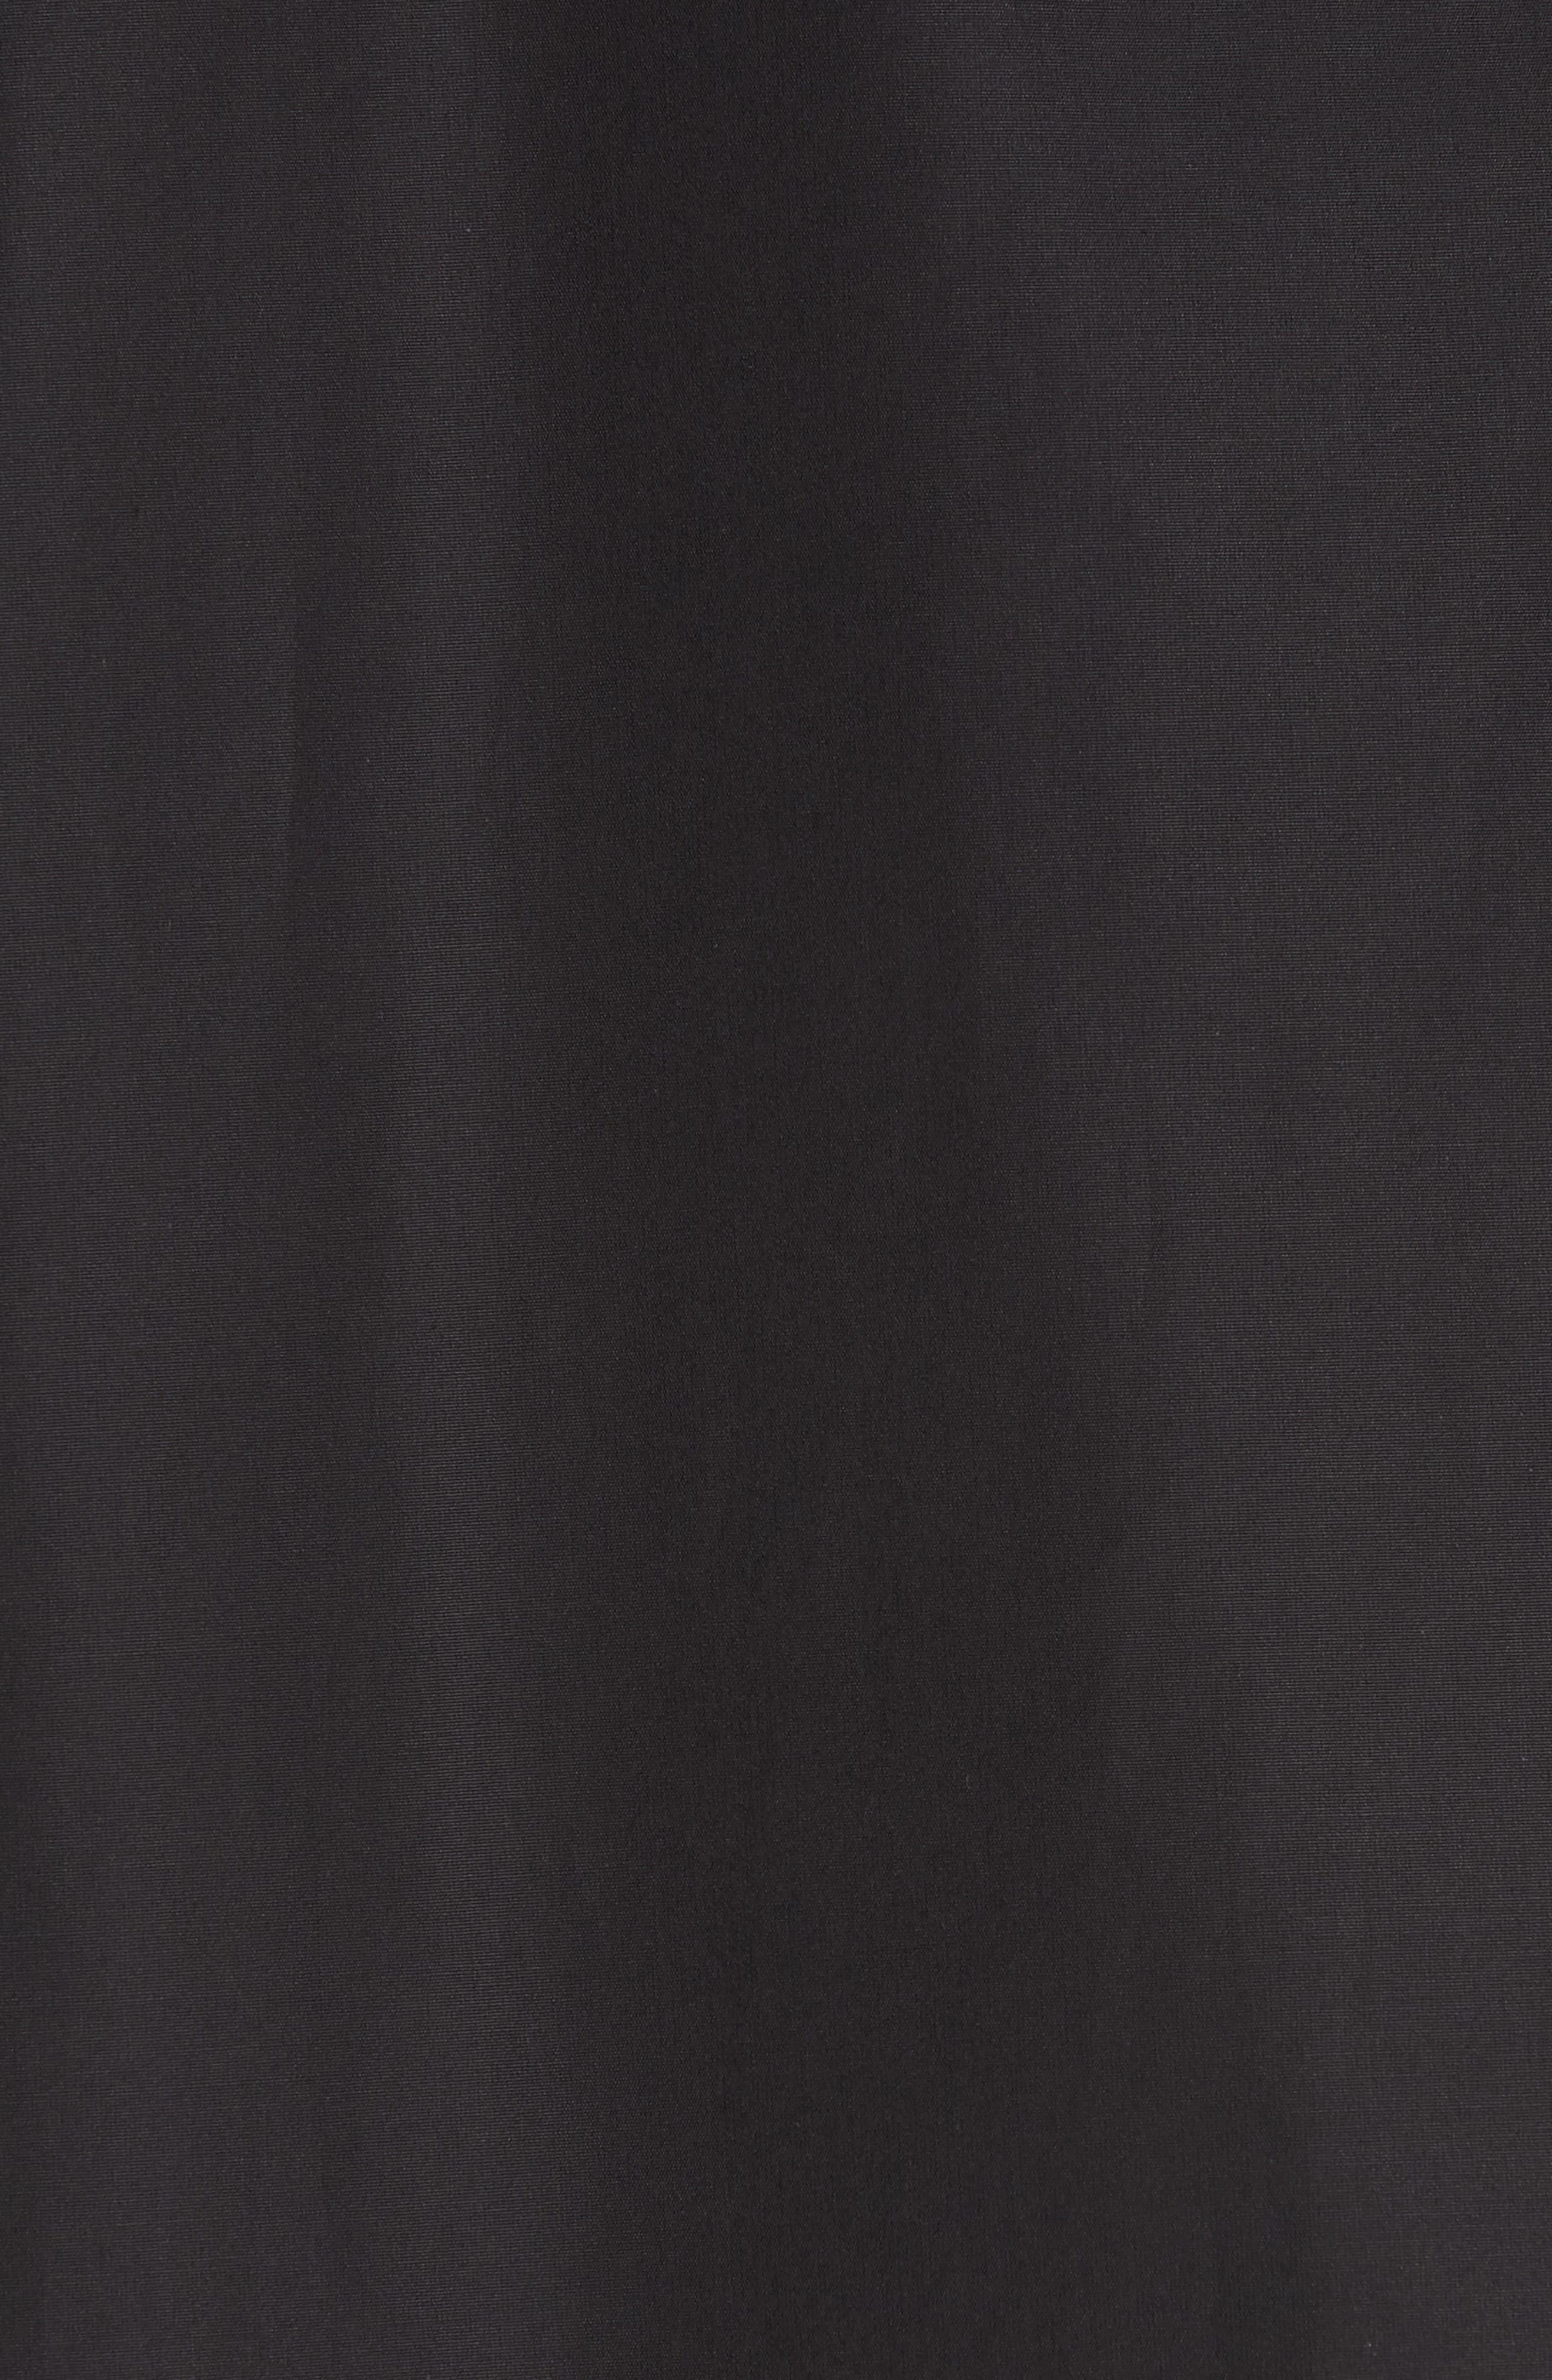 Eyelet Detail Cotton Dress,                             Alternate thumbnail 6, color,                             BLACK